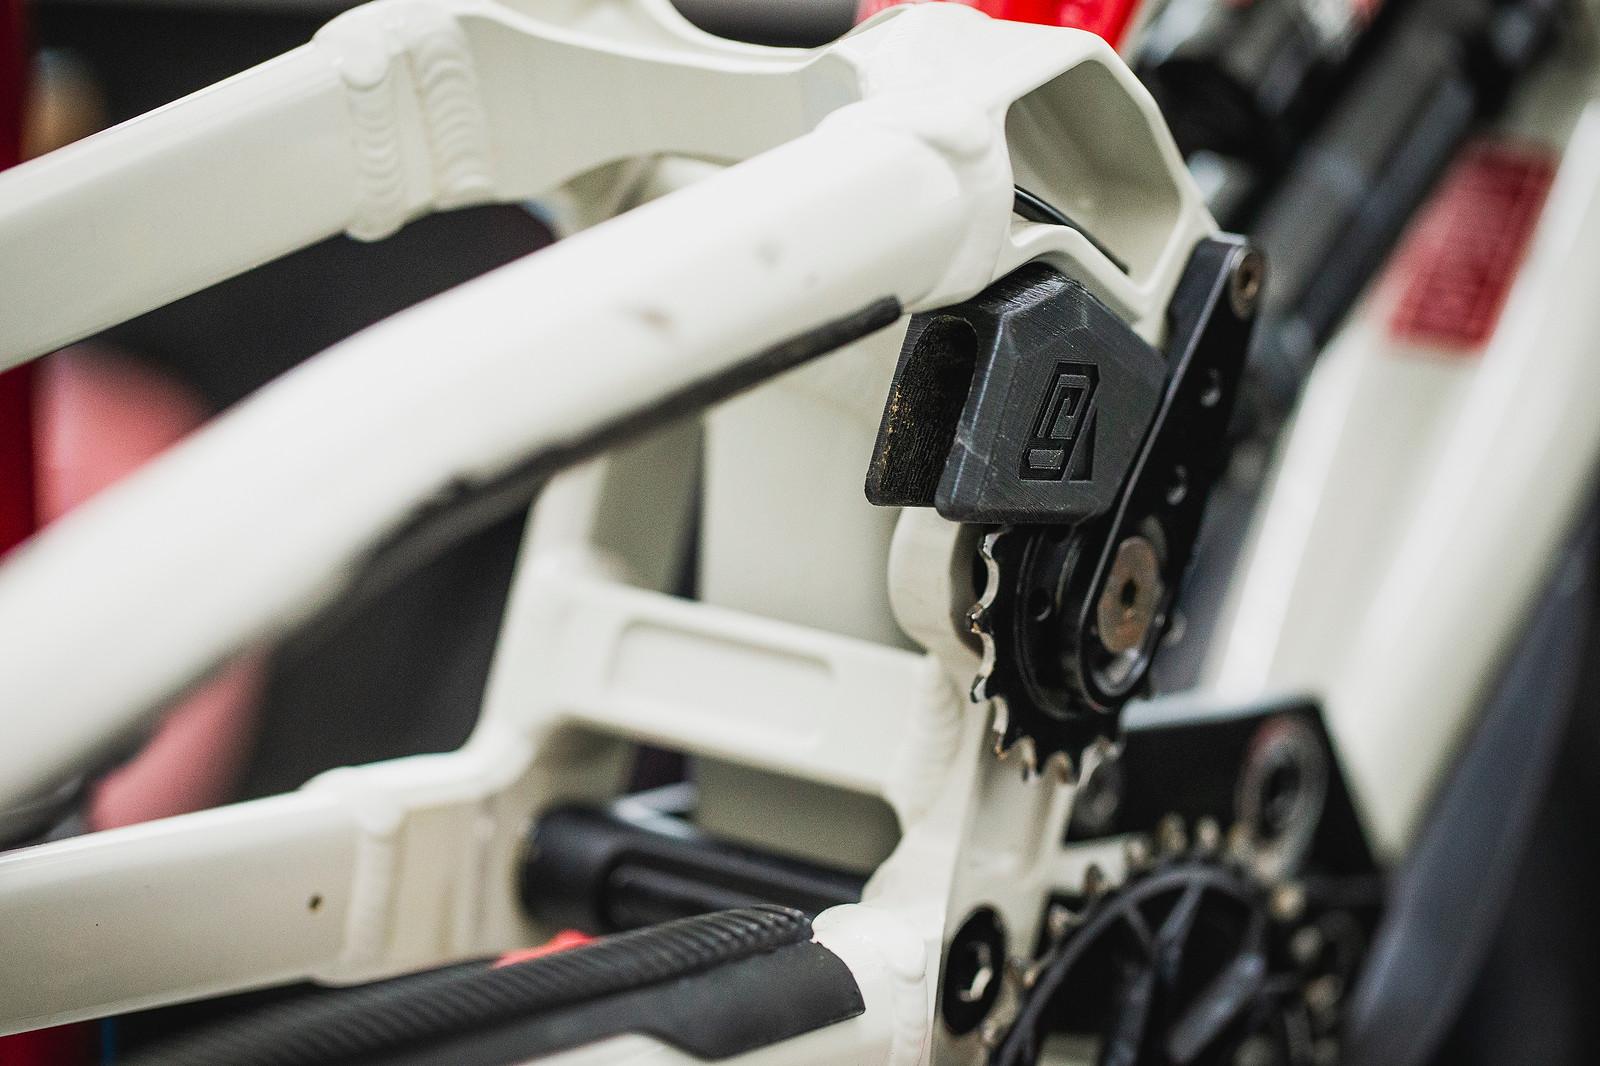 Commencal Supreme Idler Position - PIT BITS - 2019 Val di Sole World Cup Downhill Bike Tech - Mountain Biking Pictures - Vital MTB